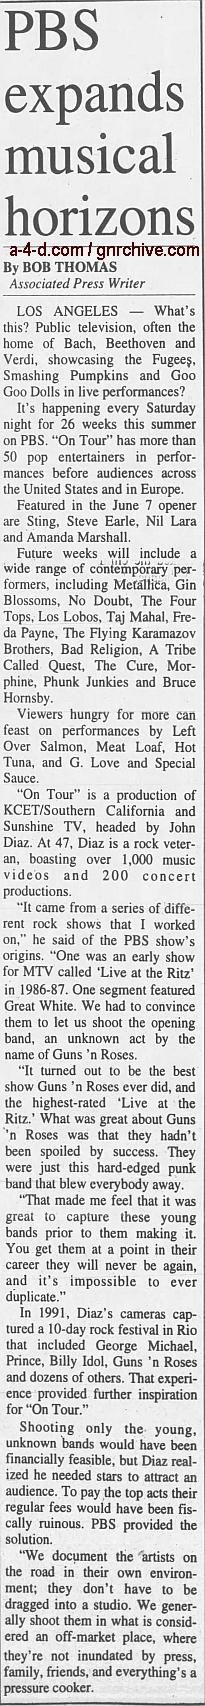 1988.02.02 - The Ritz, New York City, USA 1997_026